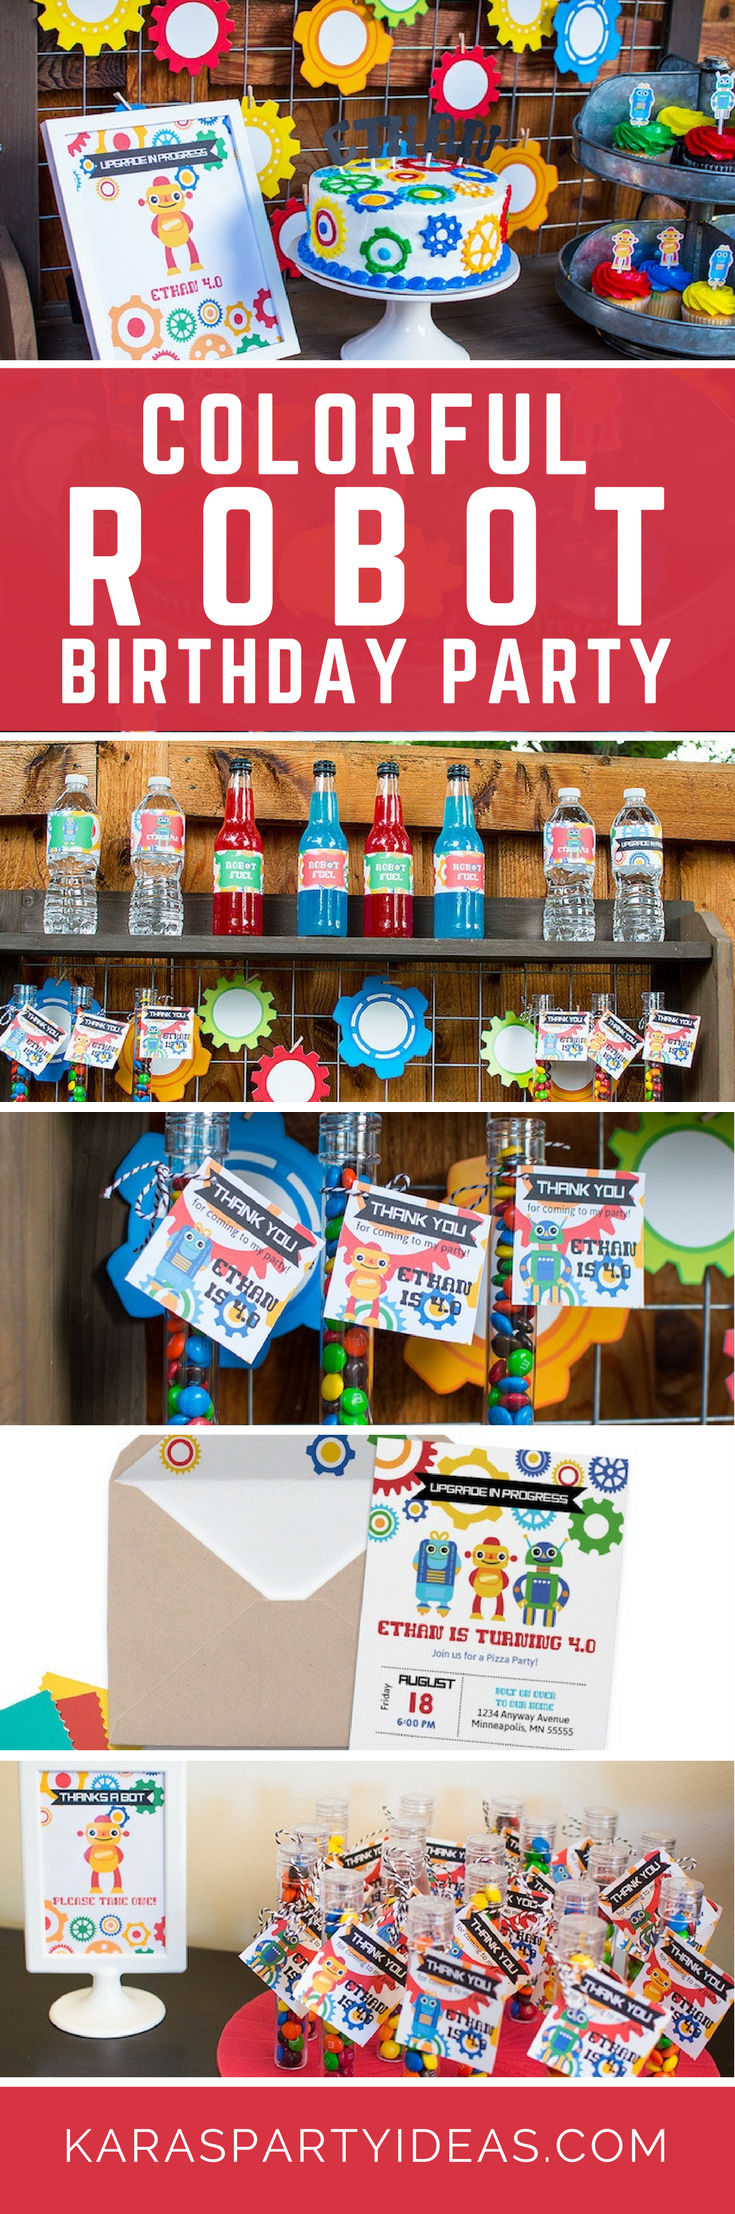 Colorful Robot Birthday Party via Kara's Party Ideas - KarasPartyIdeas.com